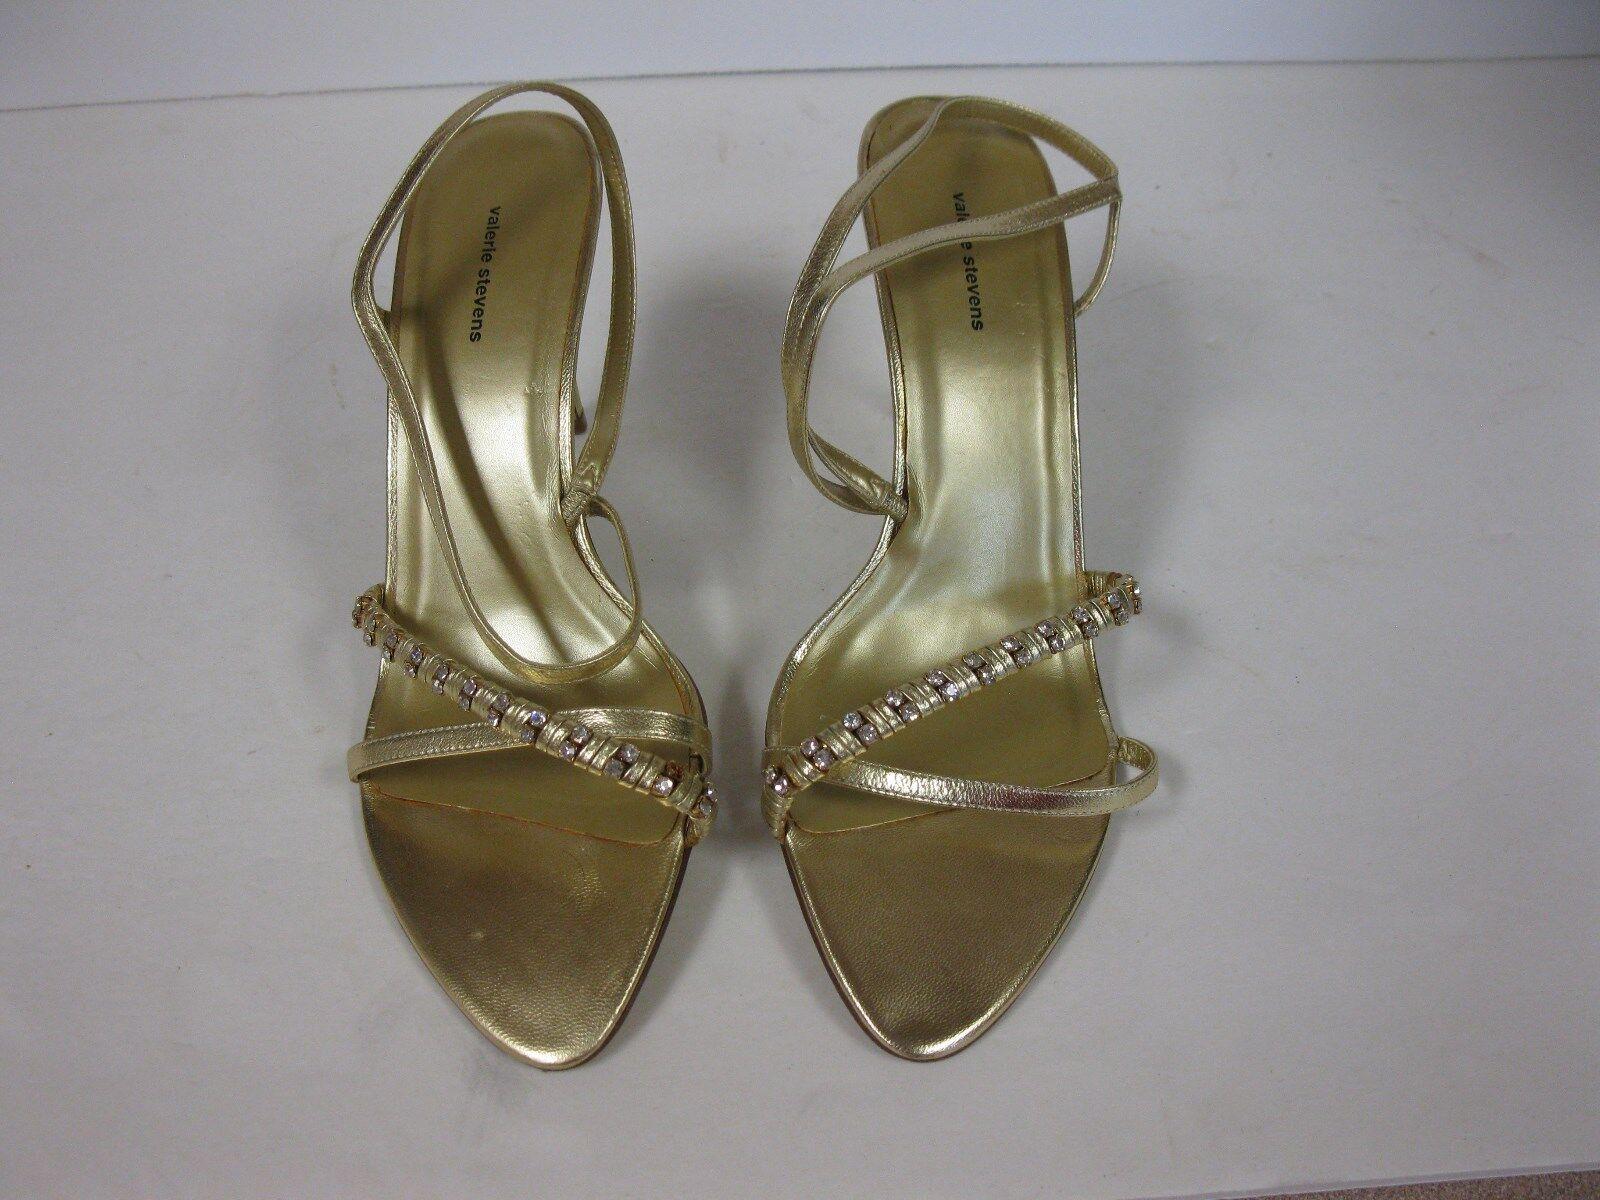 Valerie gold Stevens Fantasy gold Valerie jeweled straps heels slippers pumps leather 10M 8e813c